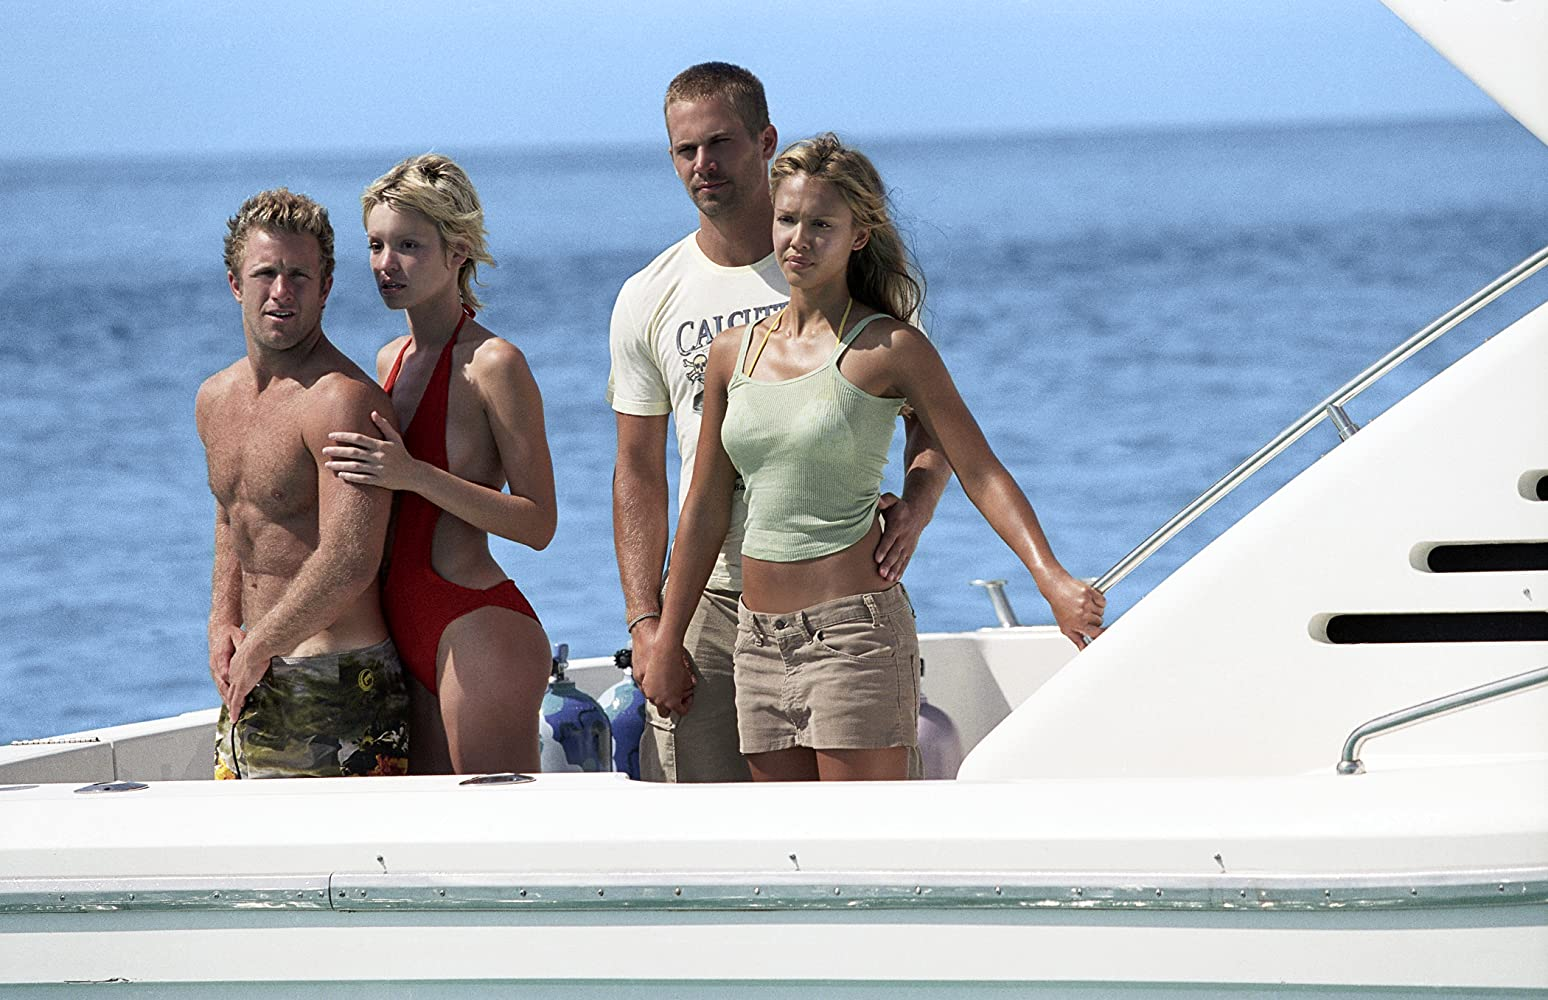 Jessica Alba, Scott Caan, Paul Walker, and Ashley Scott in Into the Blue (2005)